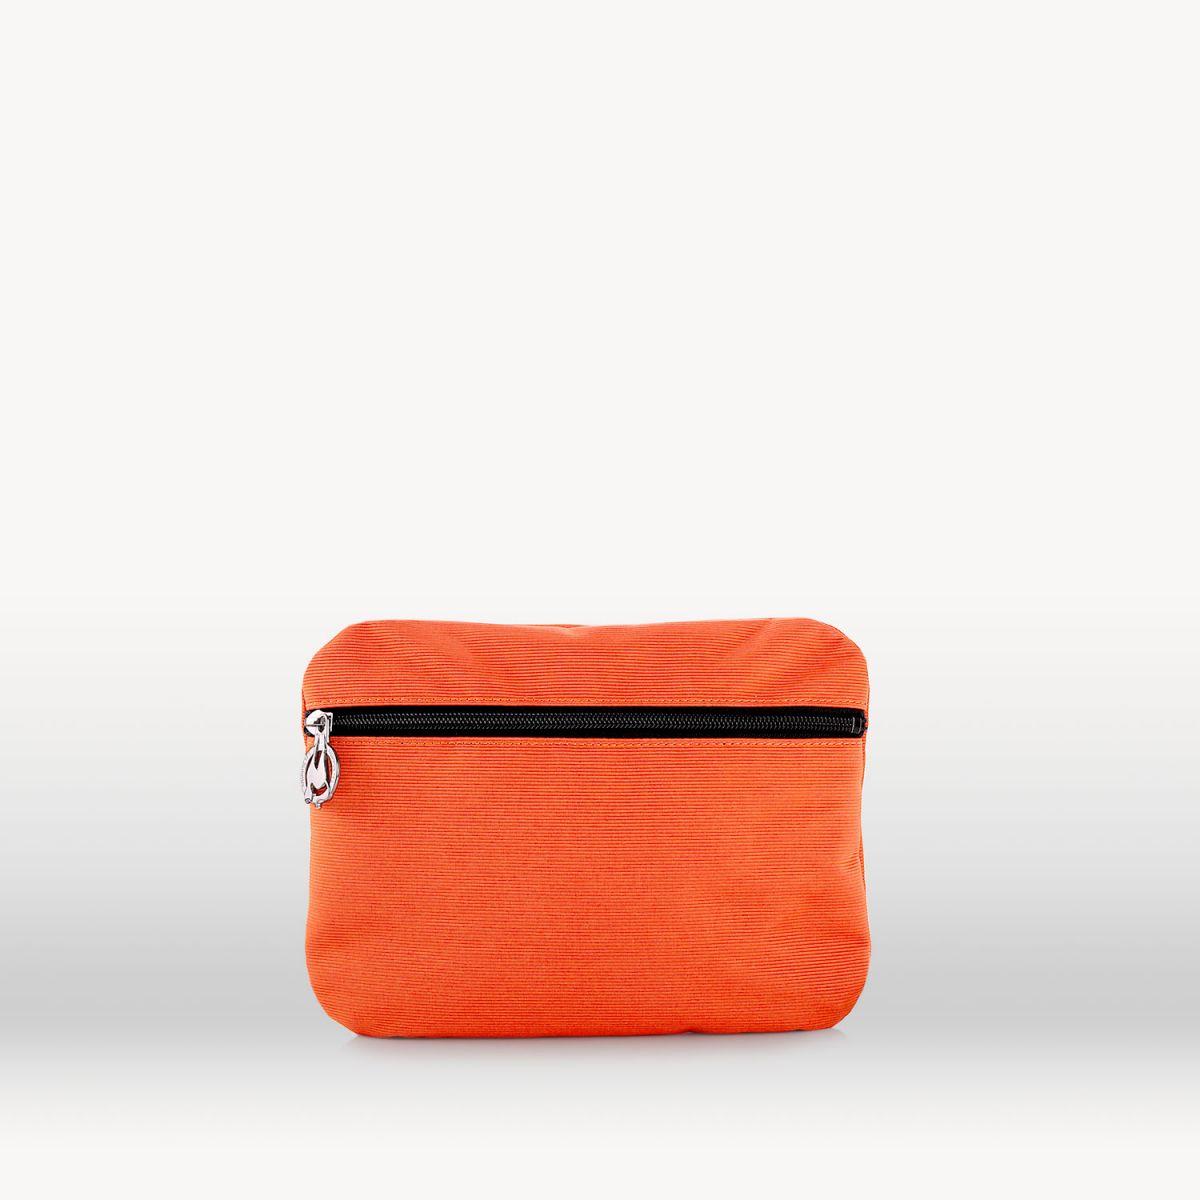 Pochette additionnelle Orange